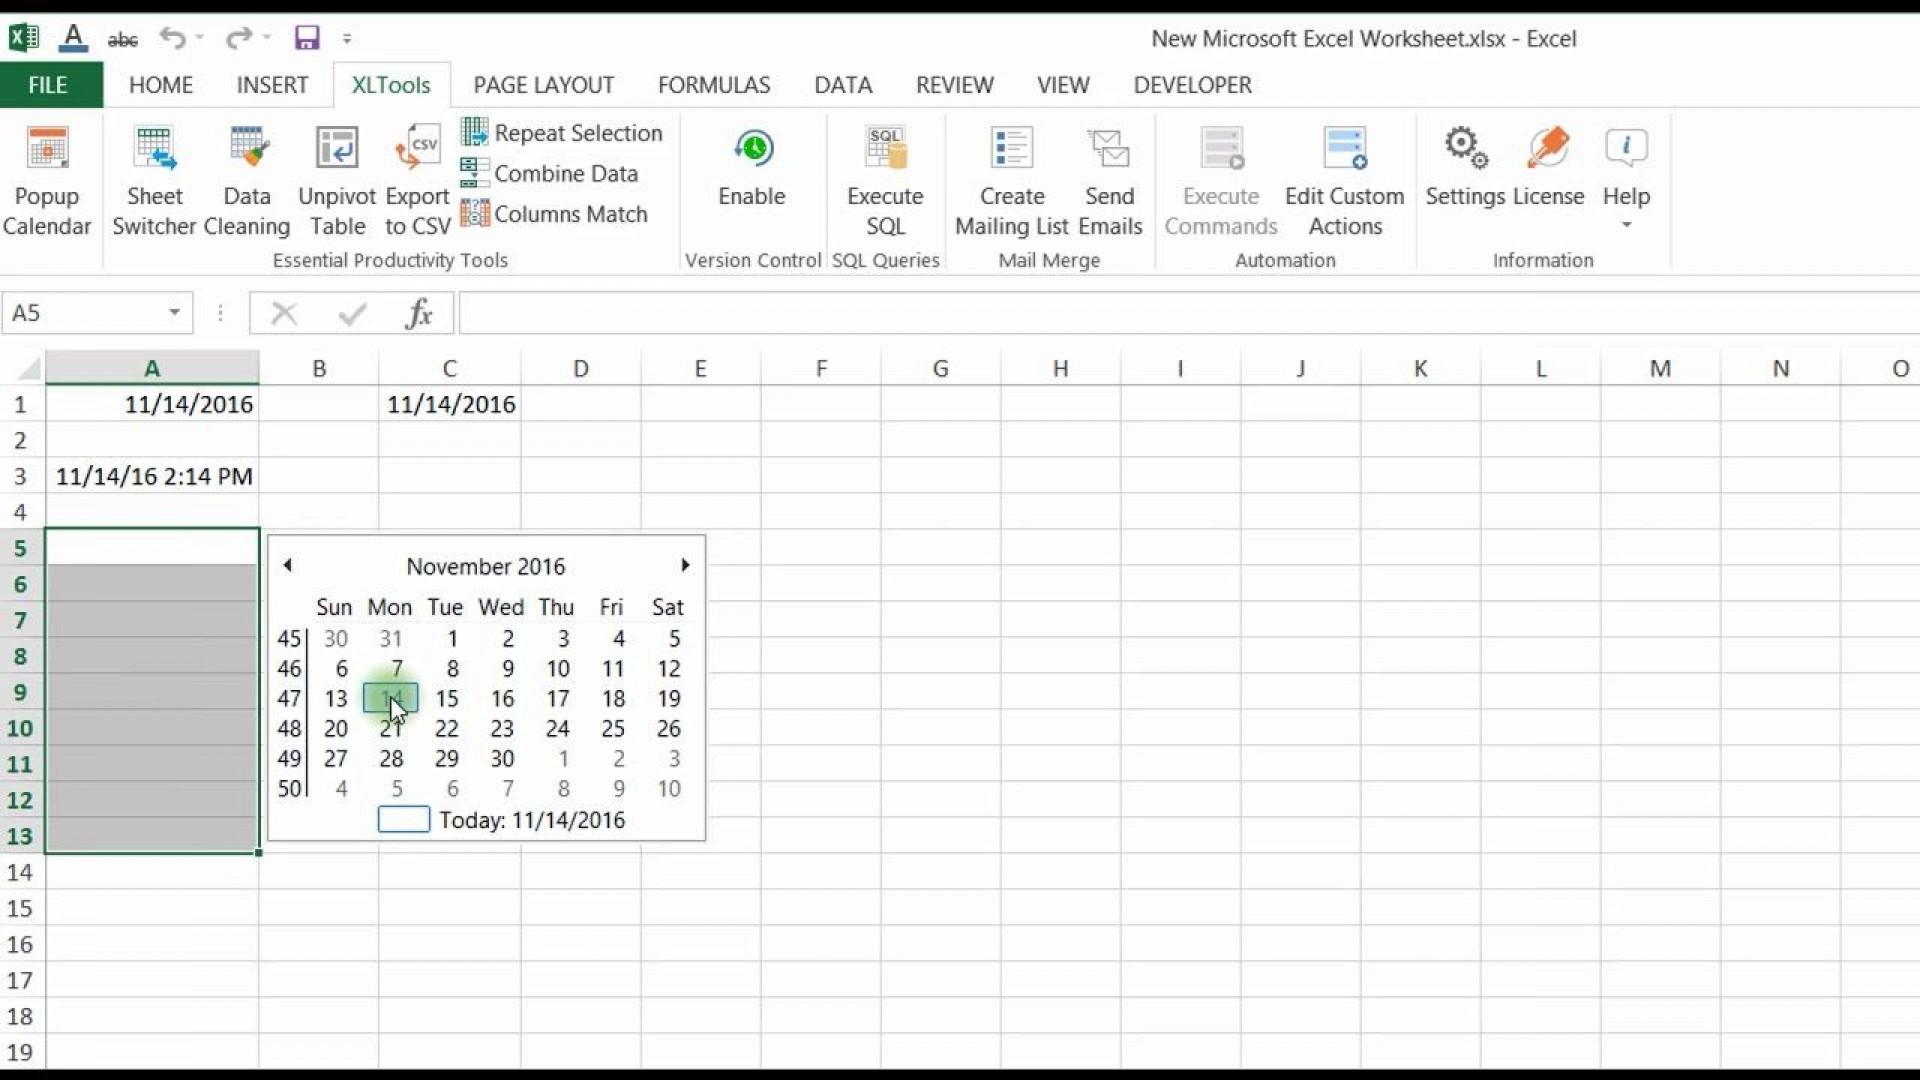 005 Best Download Calendar Template For Word 2007 Design 1920